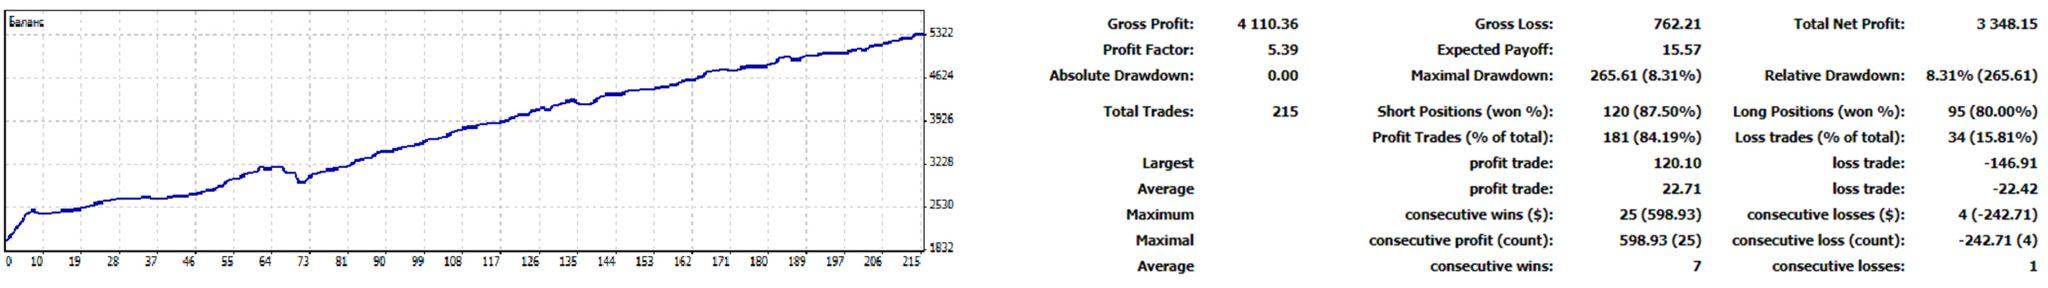 Roboti de tranzactionare la Forex: cati am testat, ce a produs profit - Milionarul Mioritic